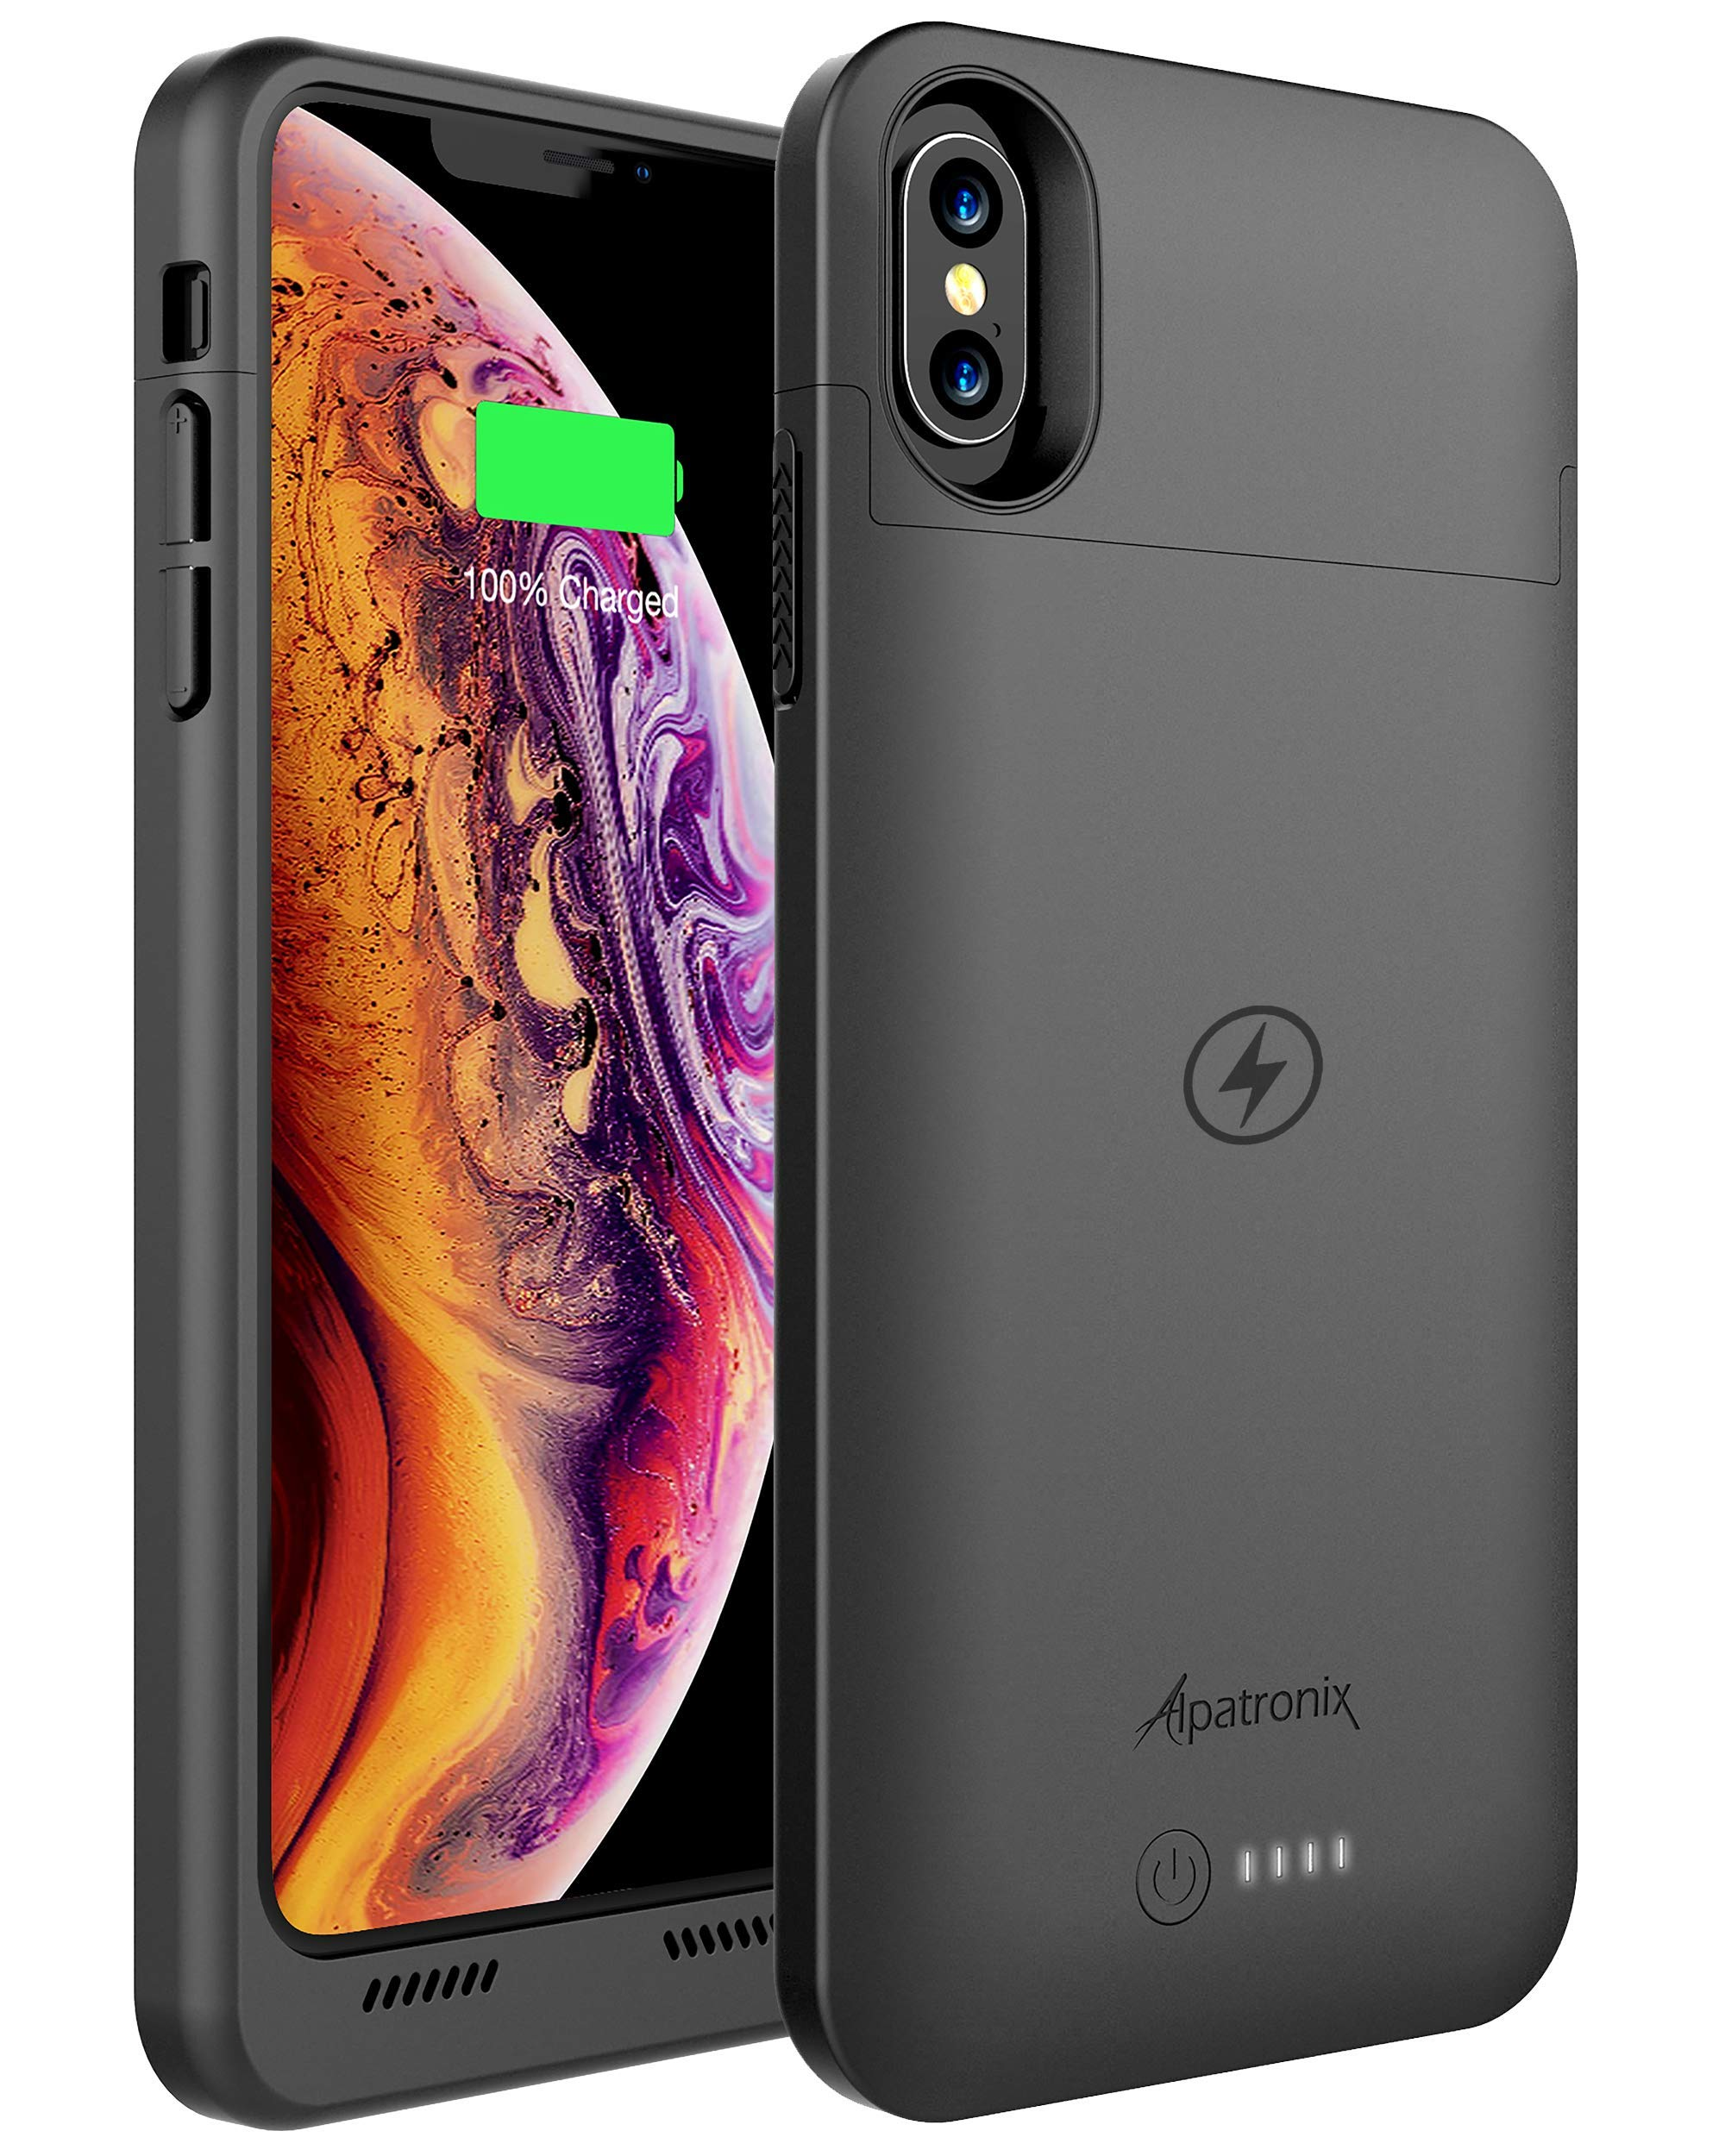 Funda Con Bateria de 5000mah para Apple Iphone Xs Max ALPATRONIX [7H89D68F]